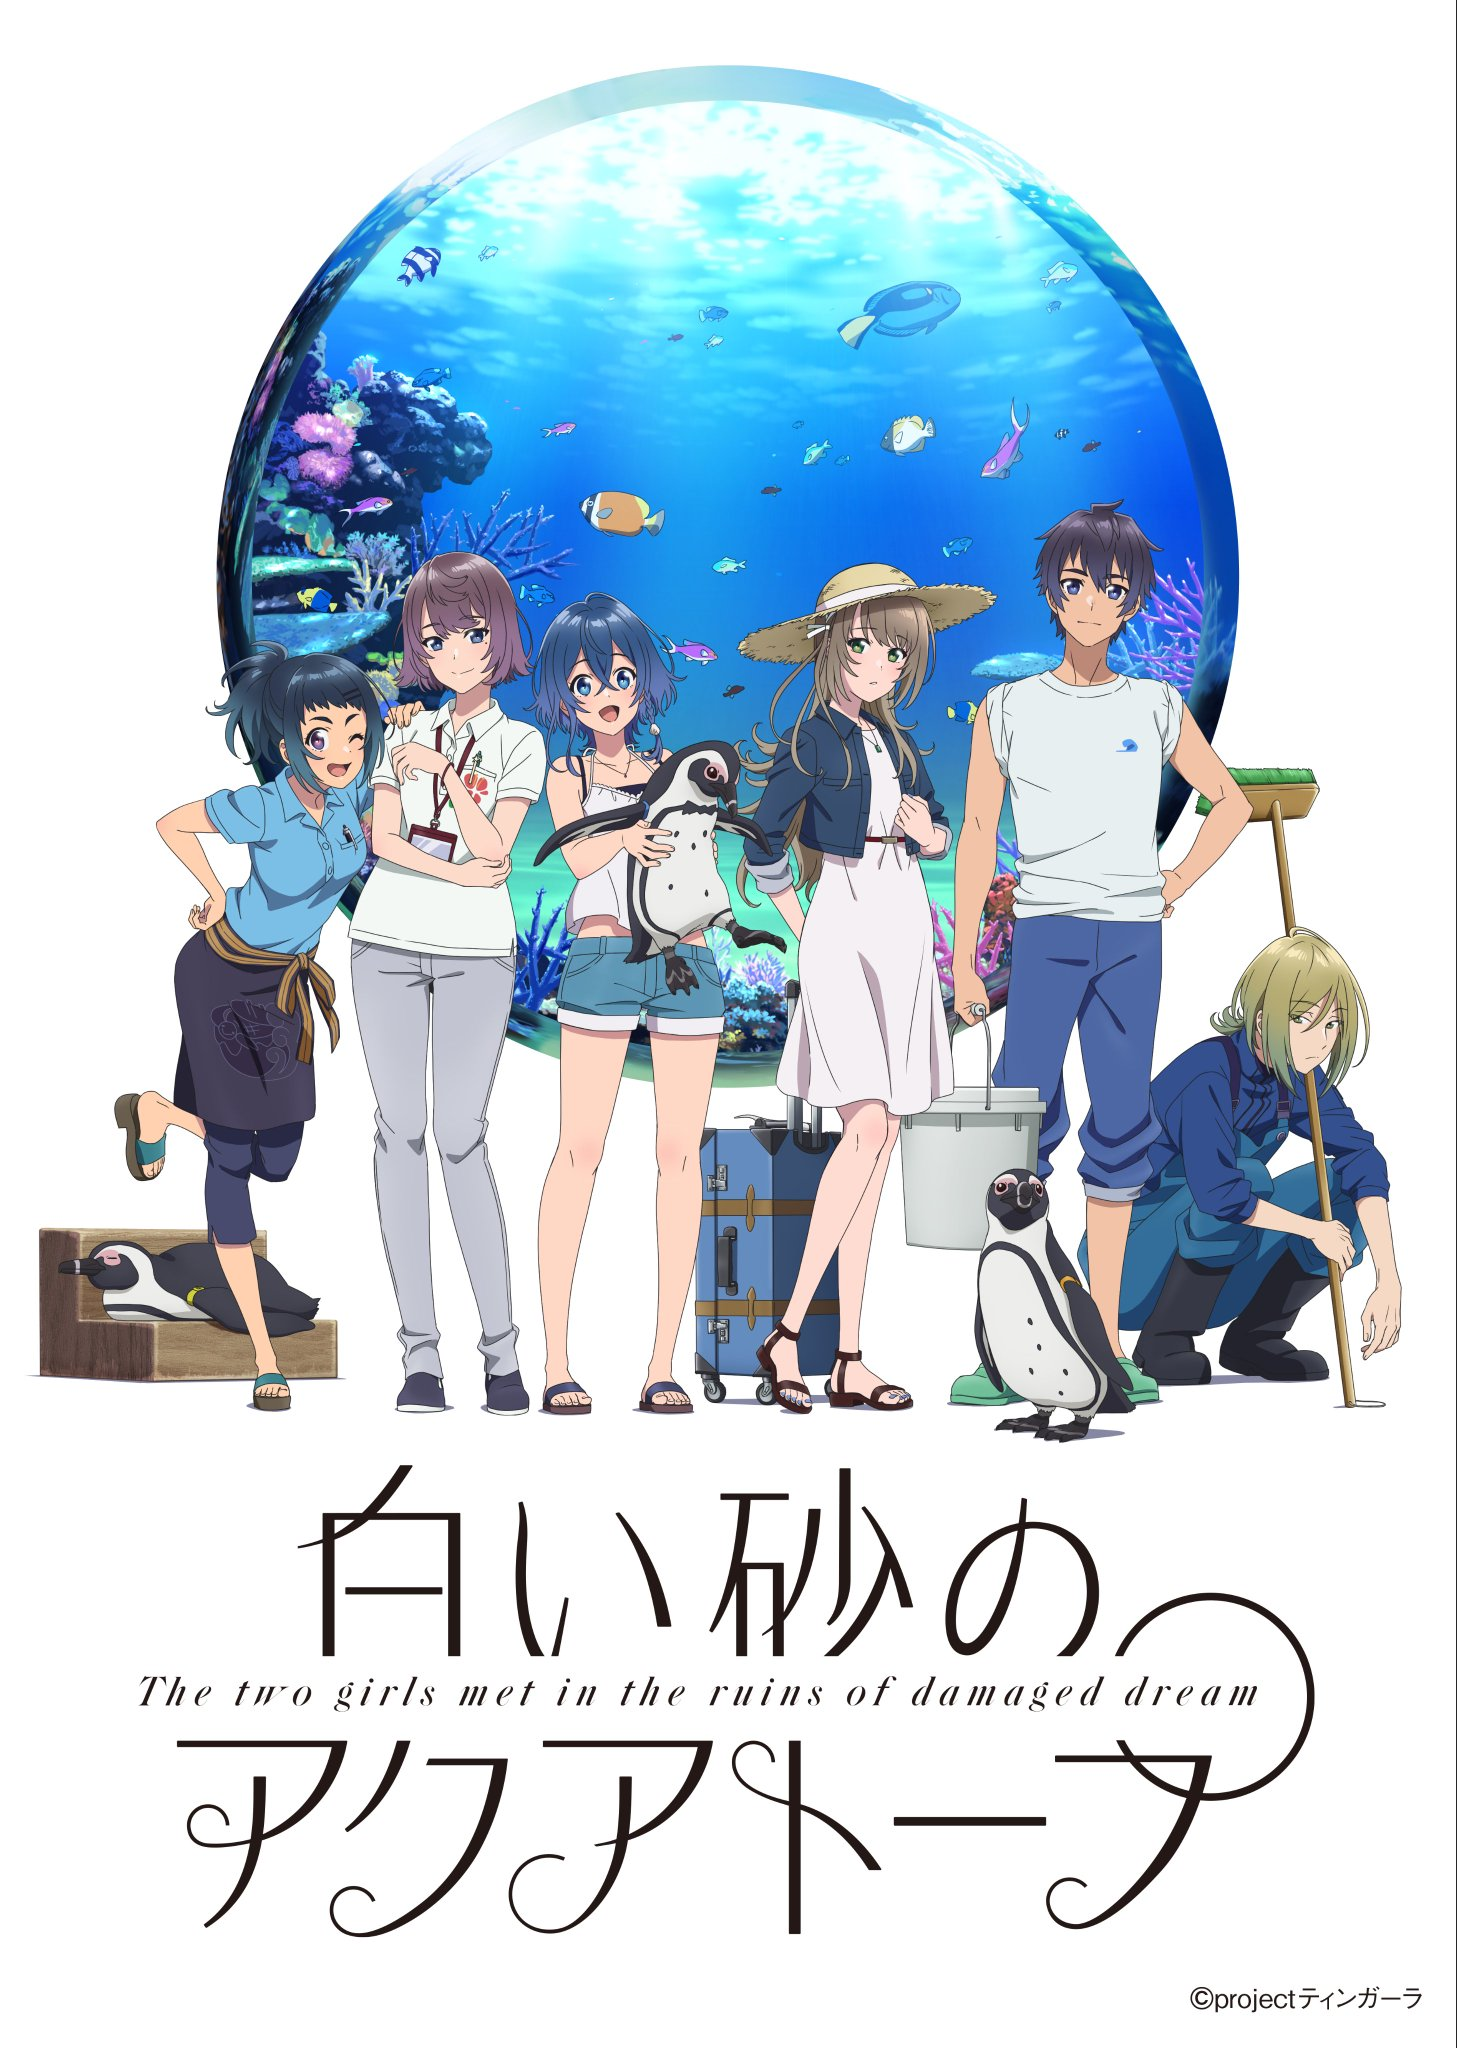 TVアニメ「白い砂のアクアトープ」キービジュアル